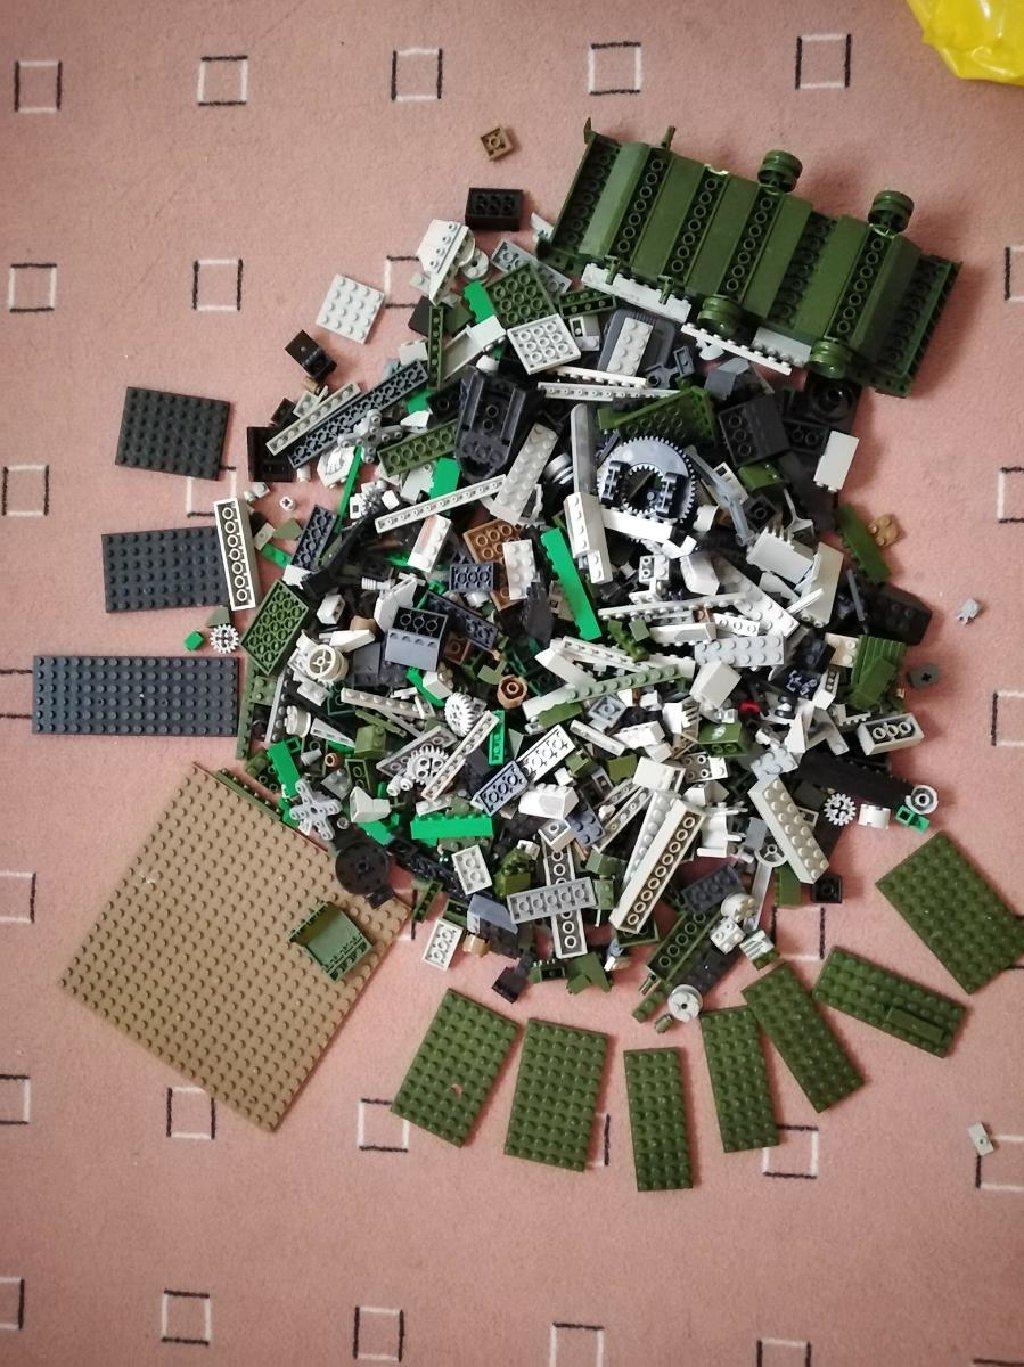 Kockice sluban kompaktibilne lego kockicama